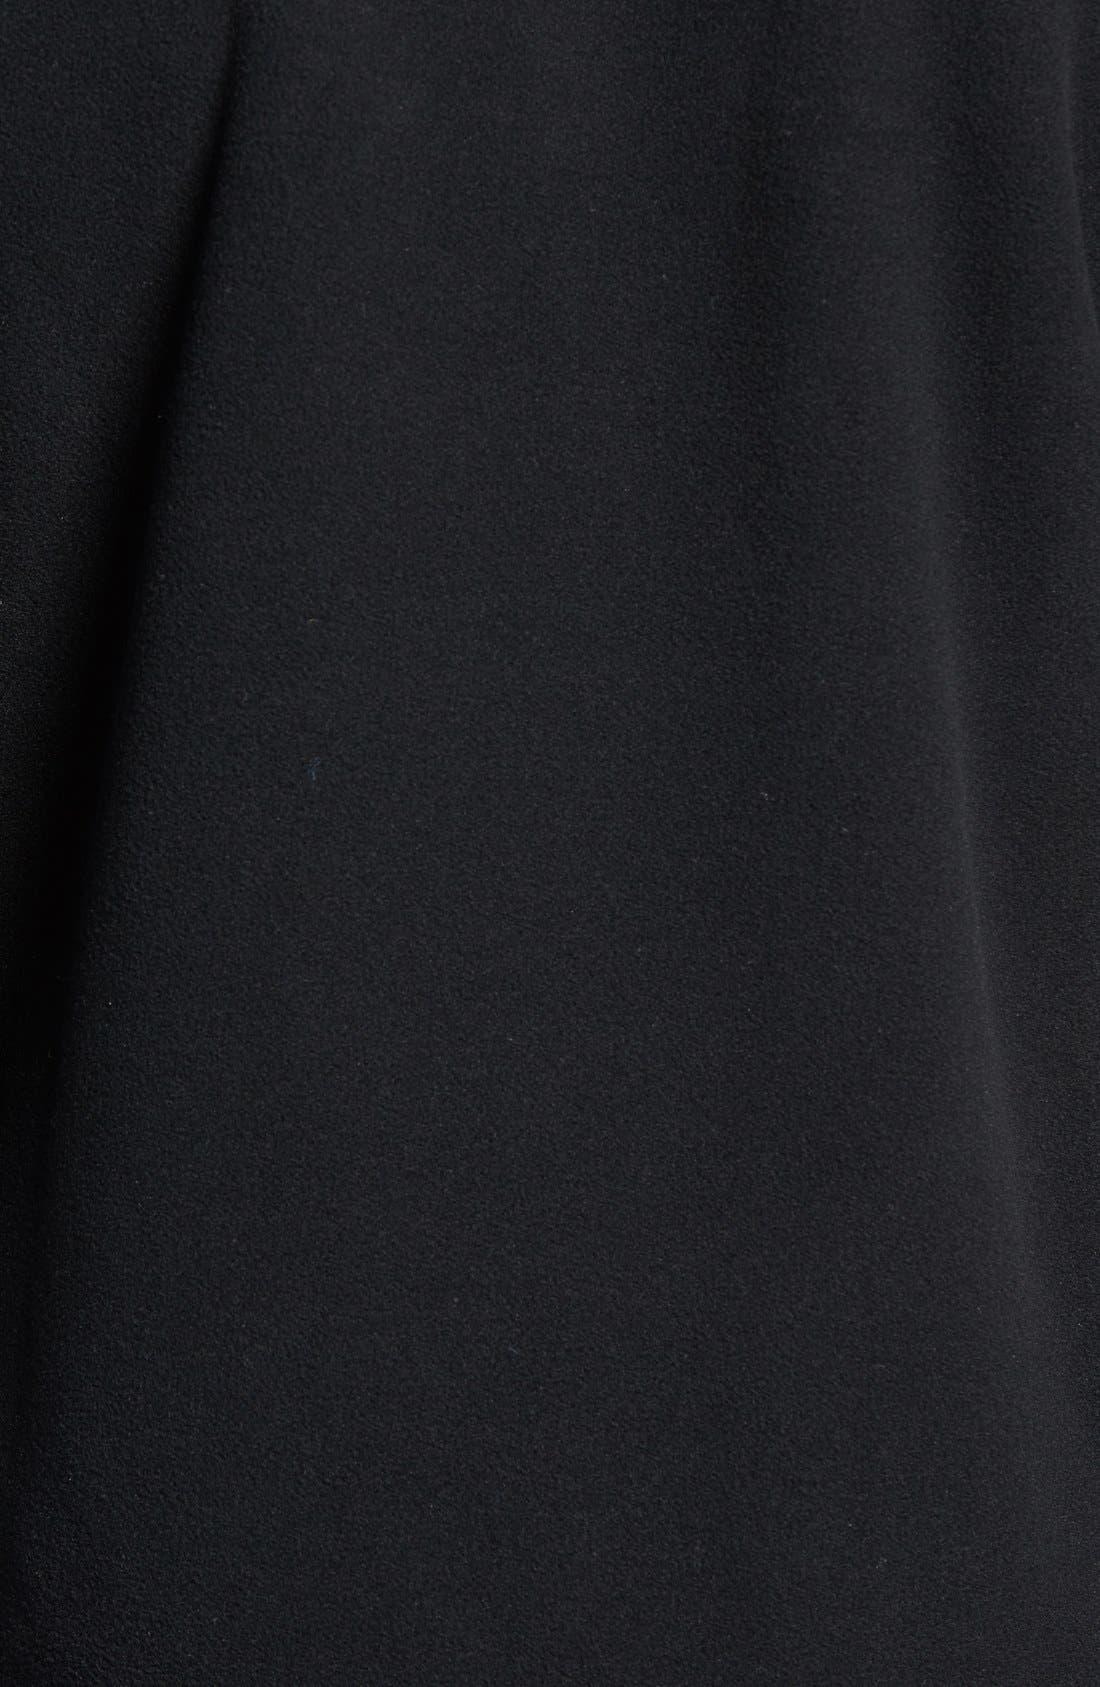 Denali 2 Fleece Hoodie,                             Alternate thumbnail 5, color,                             Recycled Tnf Black